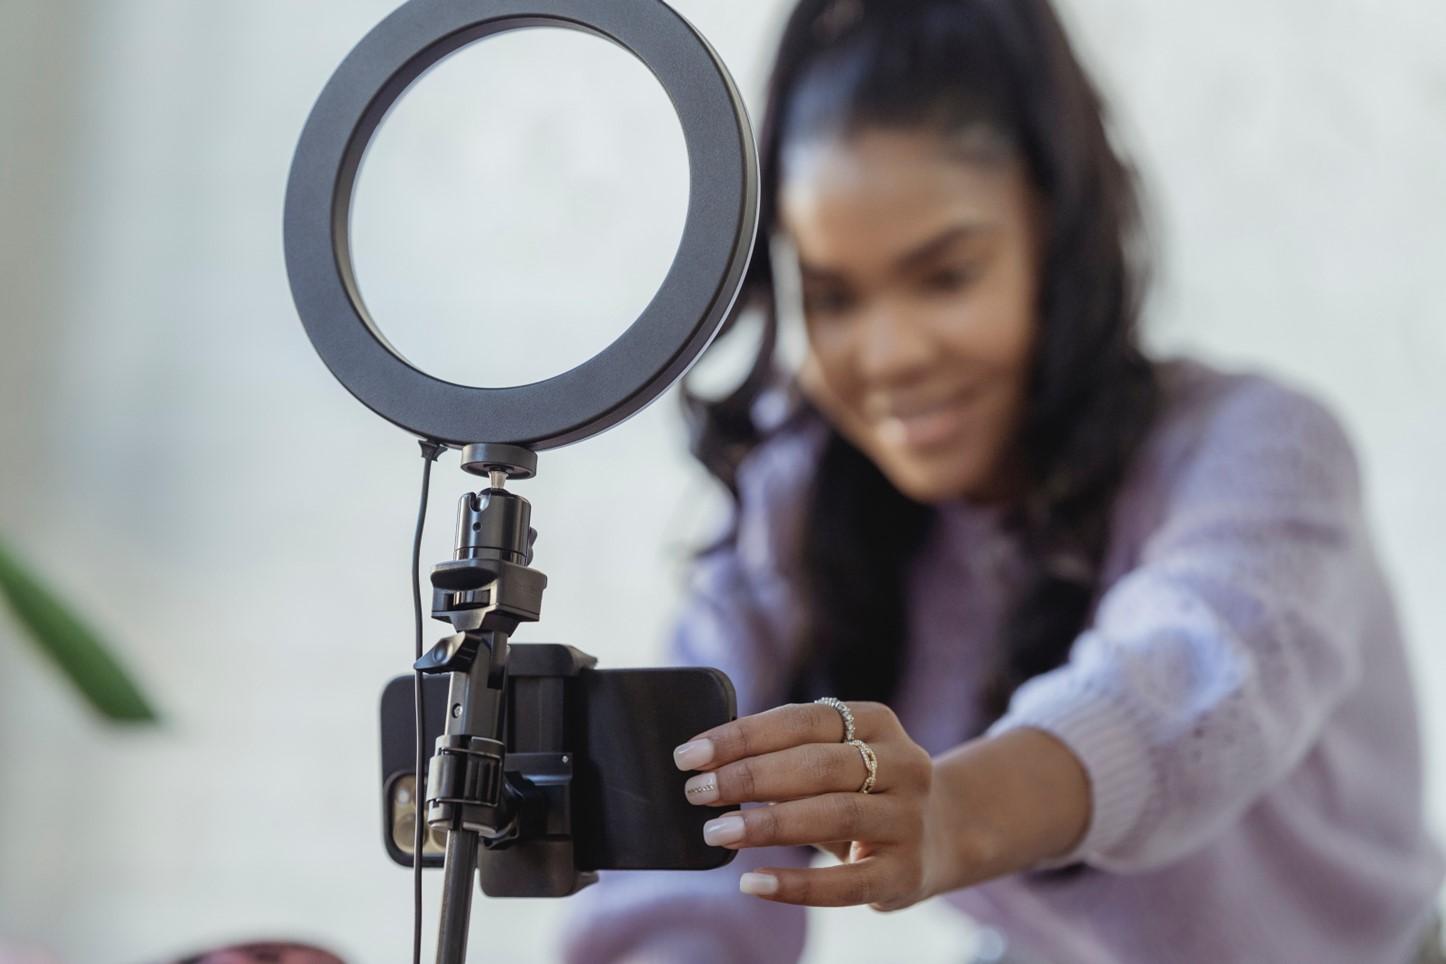 video-trends-to-watch-for-2021-2023-social-media-massmedia-marketing-advertising-pr